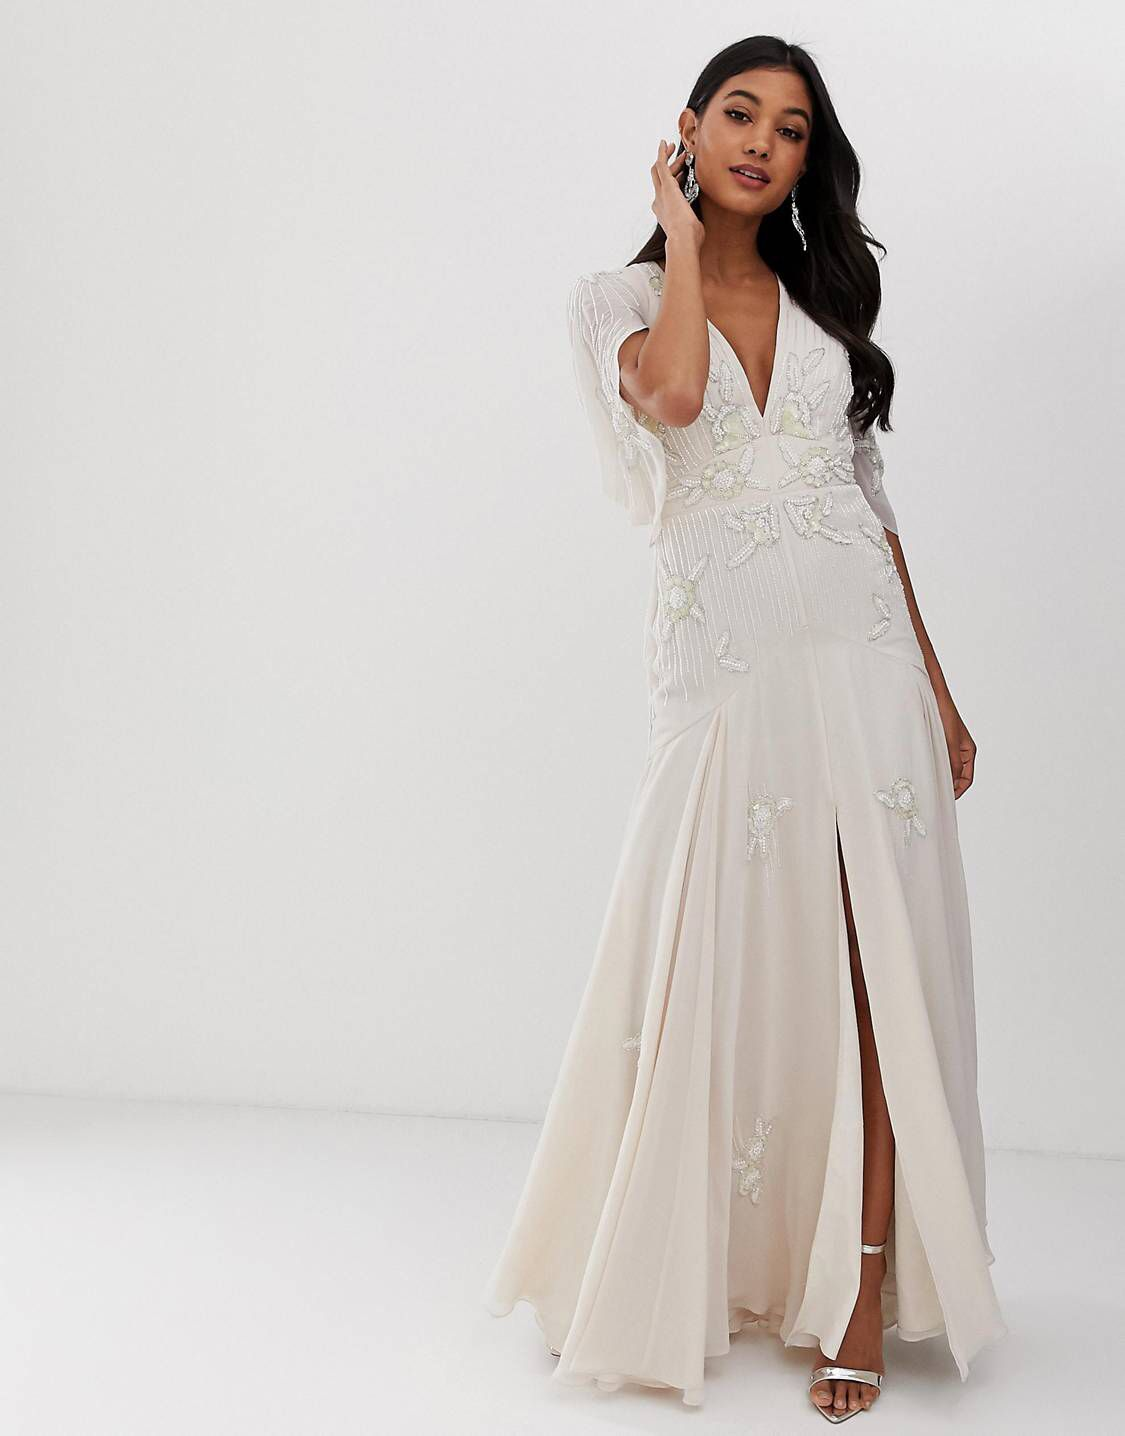 d4dc6d56f6f7 Alternative Wedding Dresses, Couple Outfits, Wedding Makeup, Asos, Special  Occasion, Dress